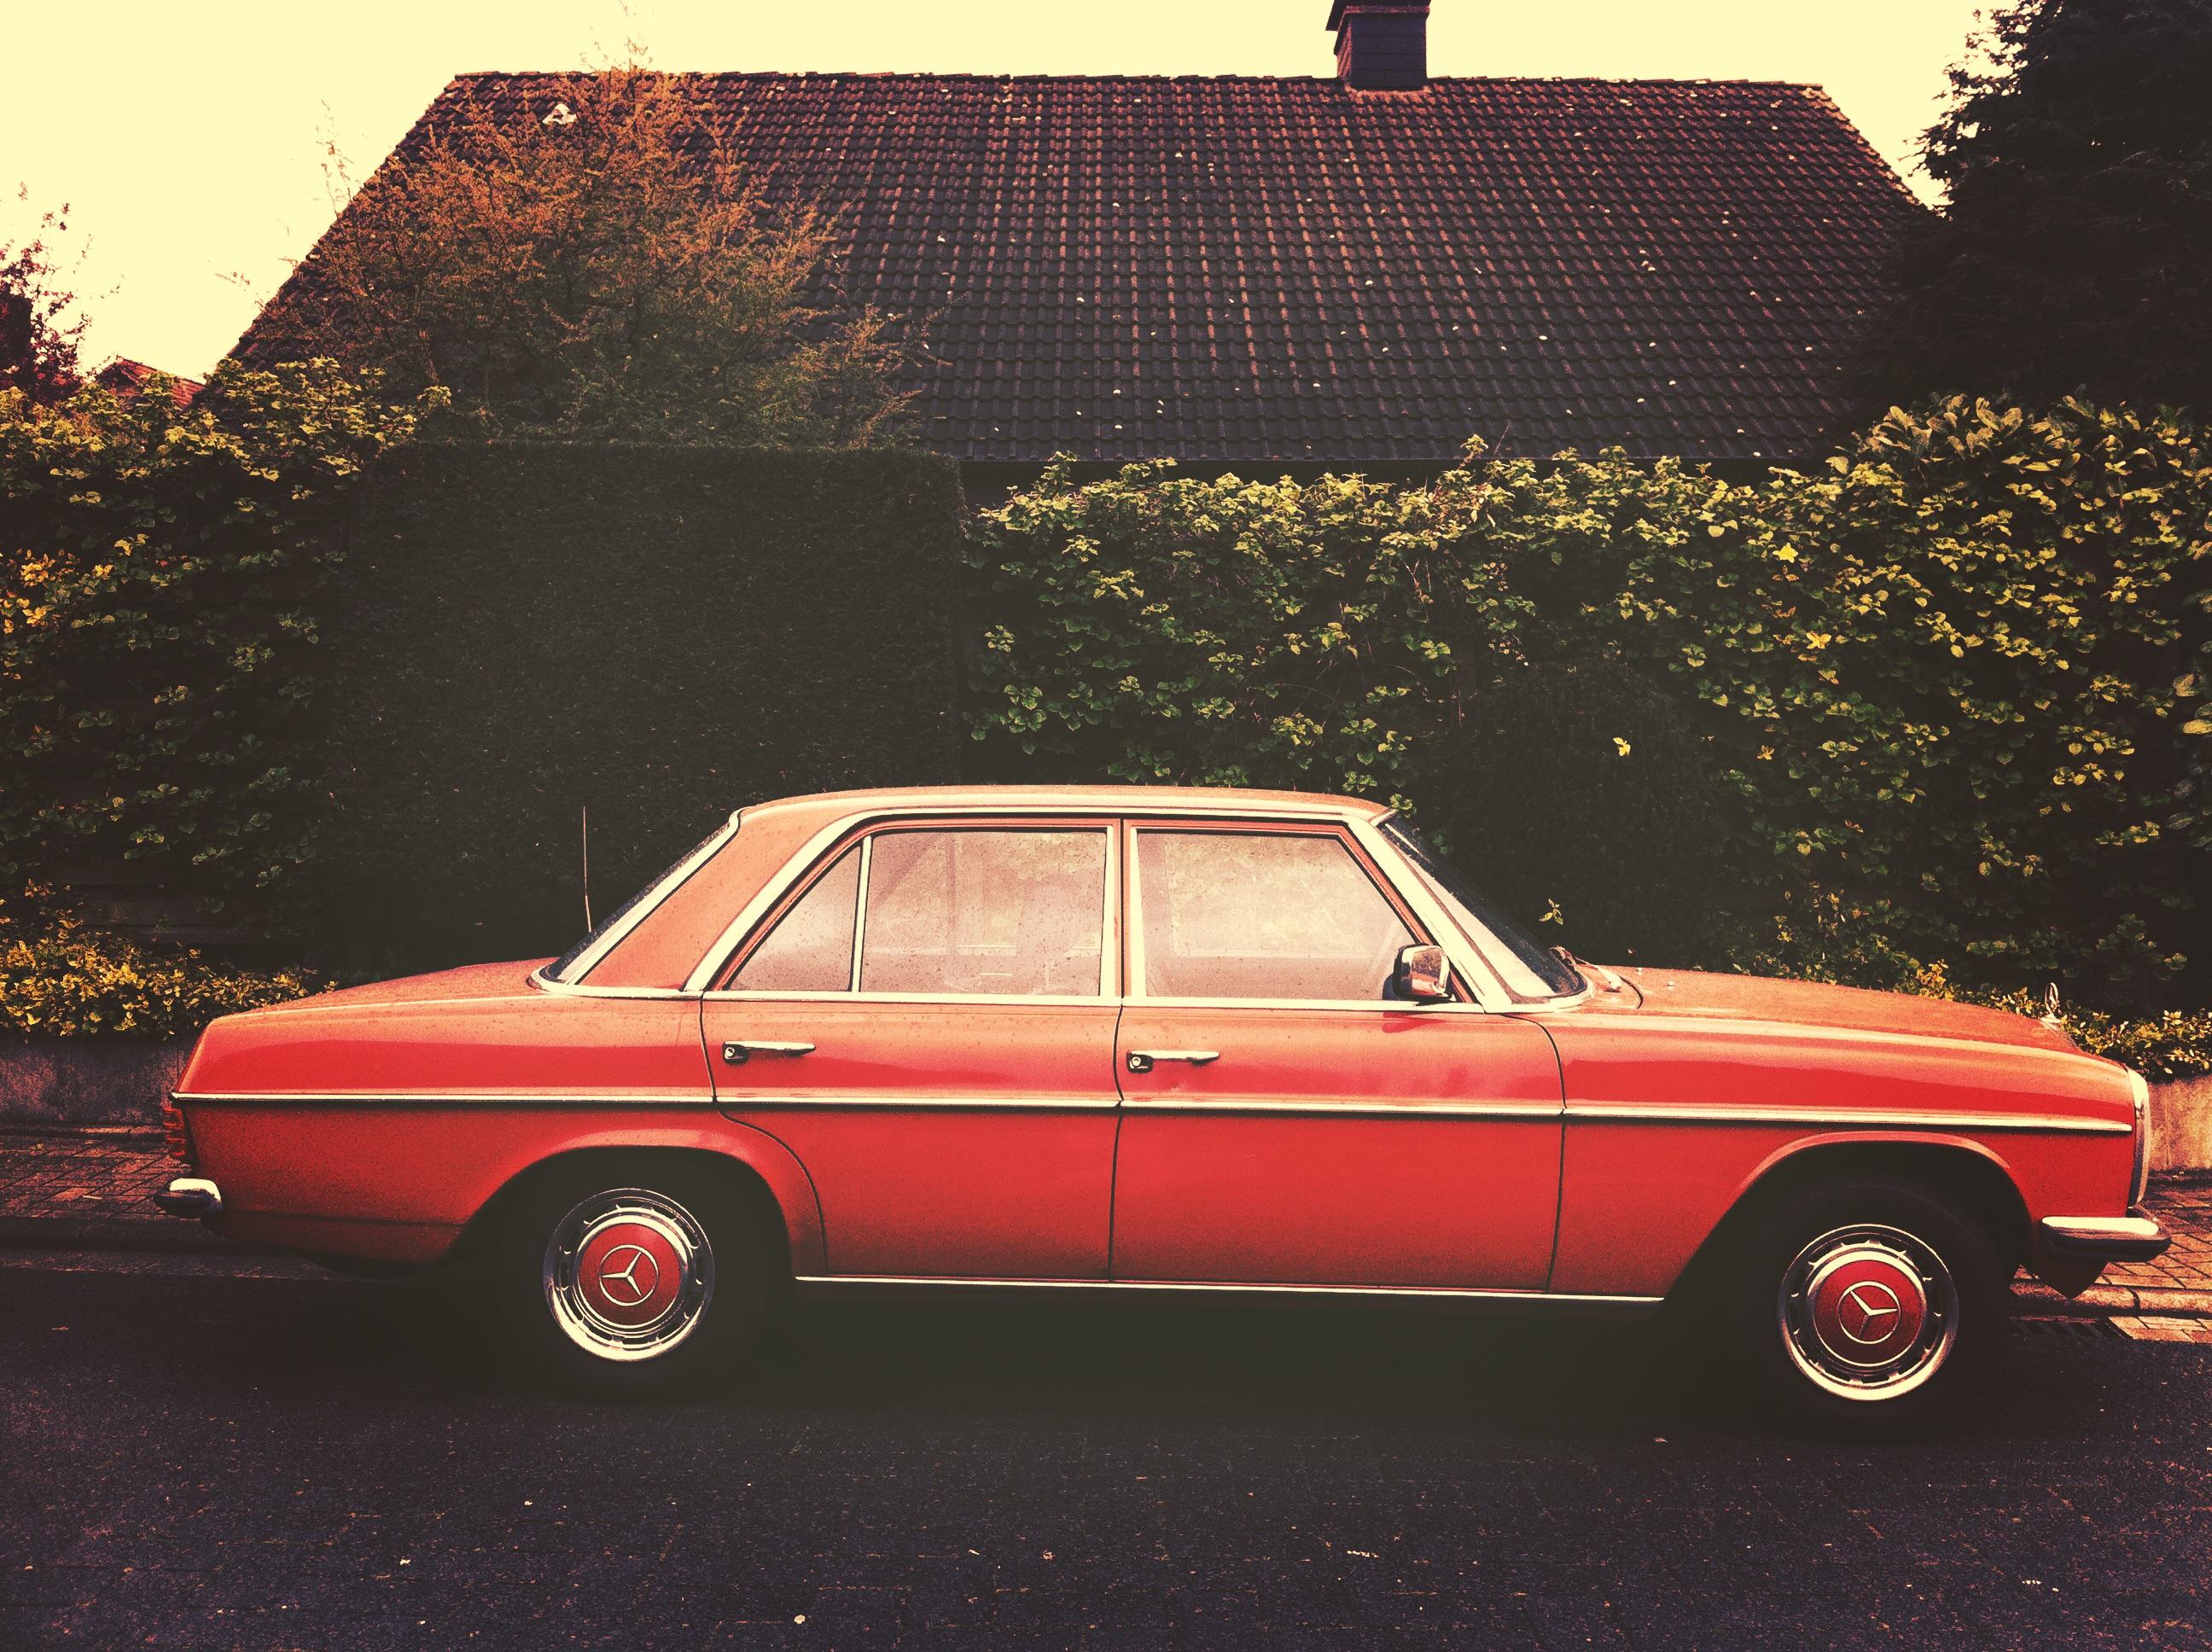 free images : classic car, vintage car, ford, sedan, limousine